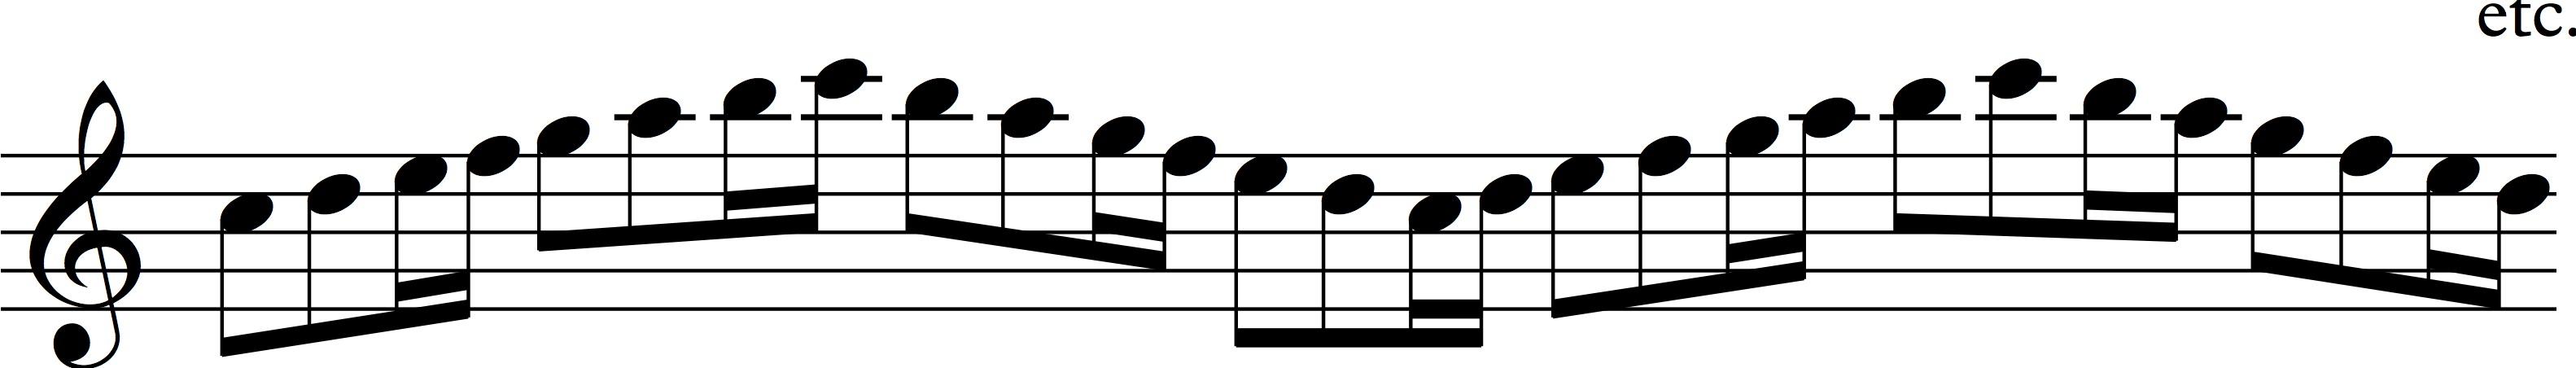 Scale 3 rhtyhm 3.jpg